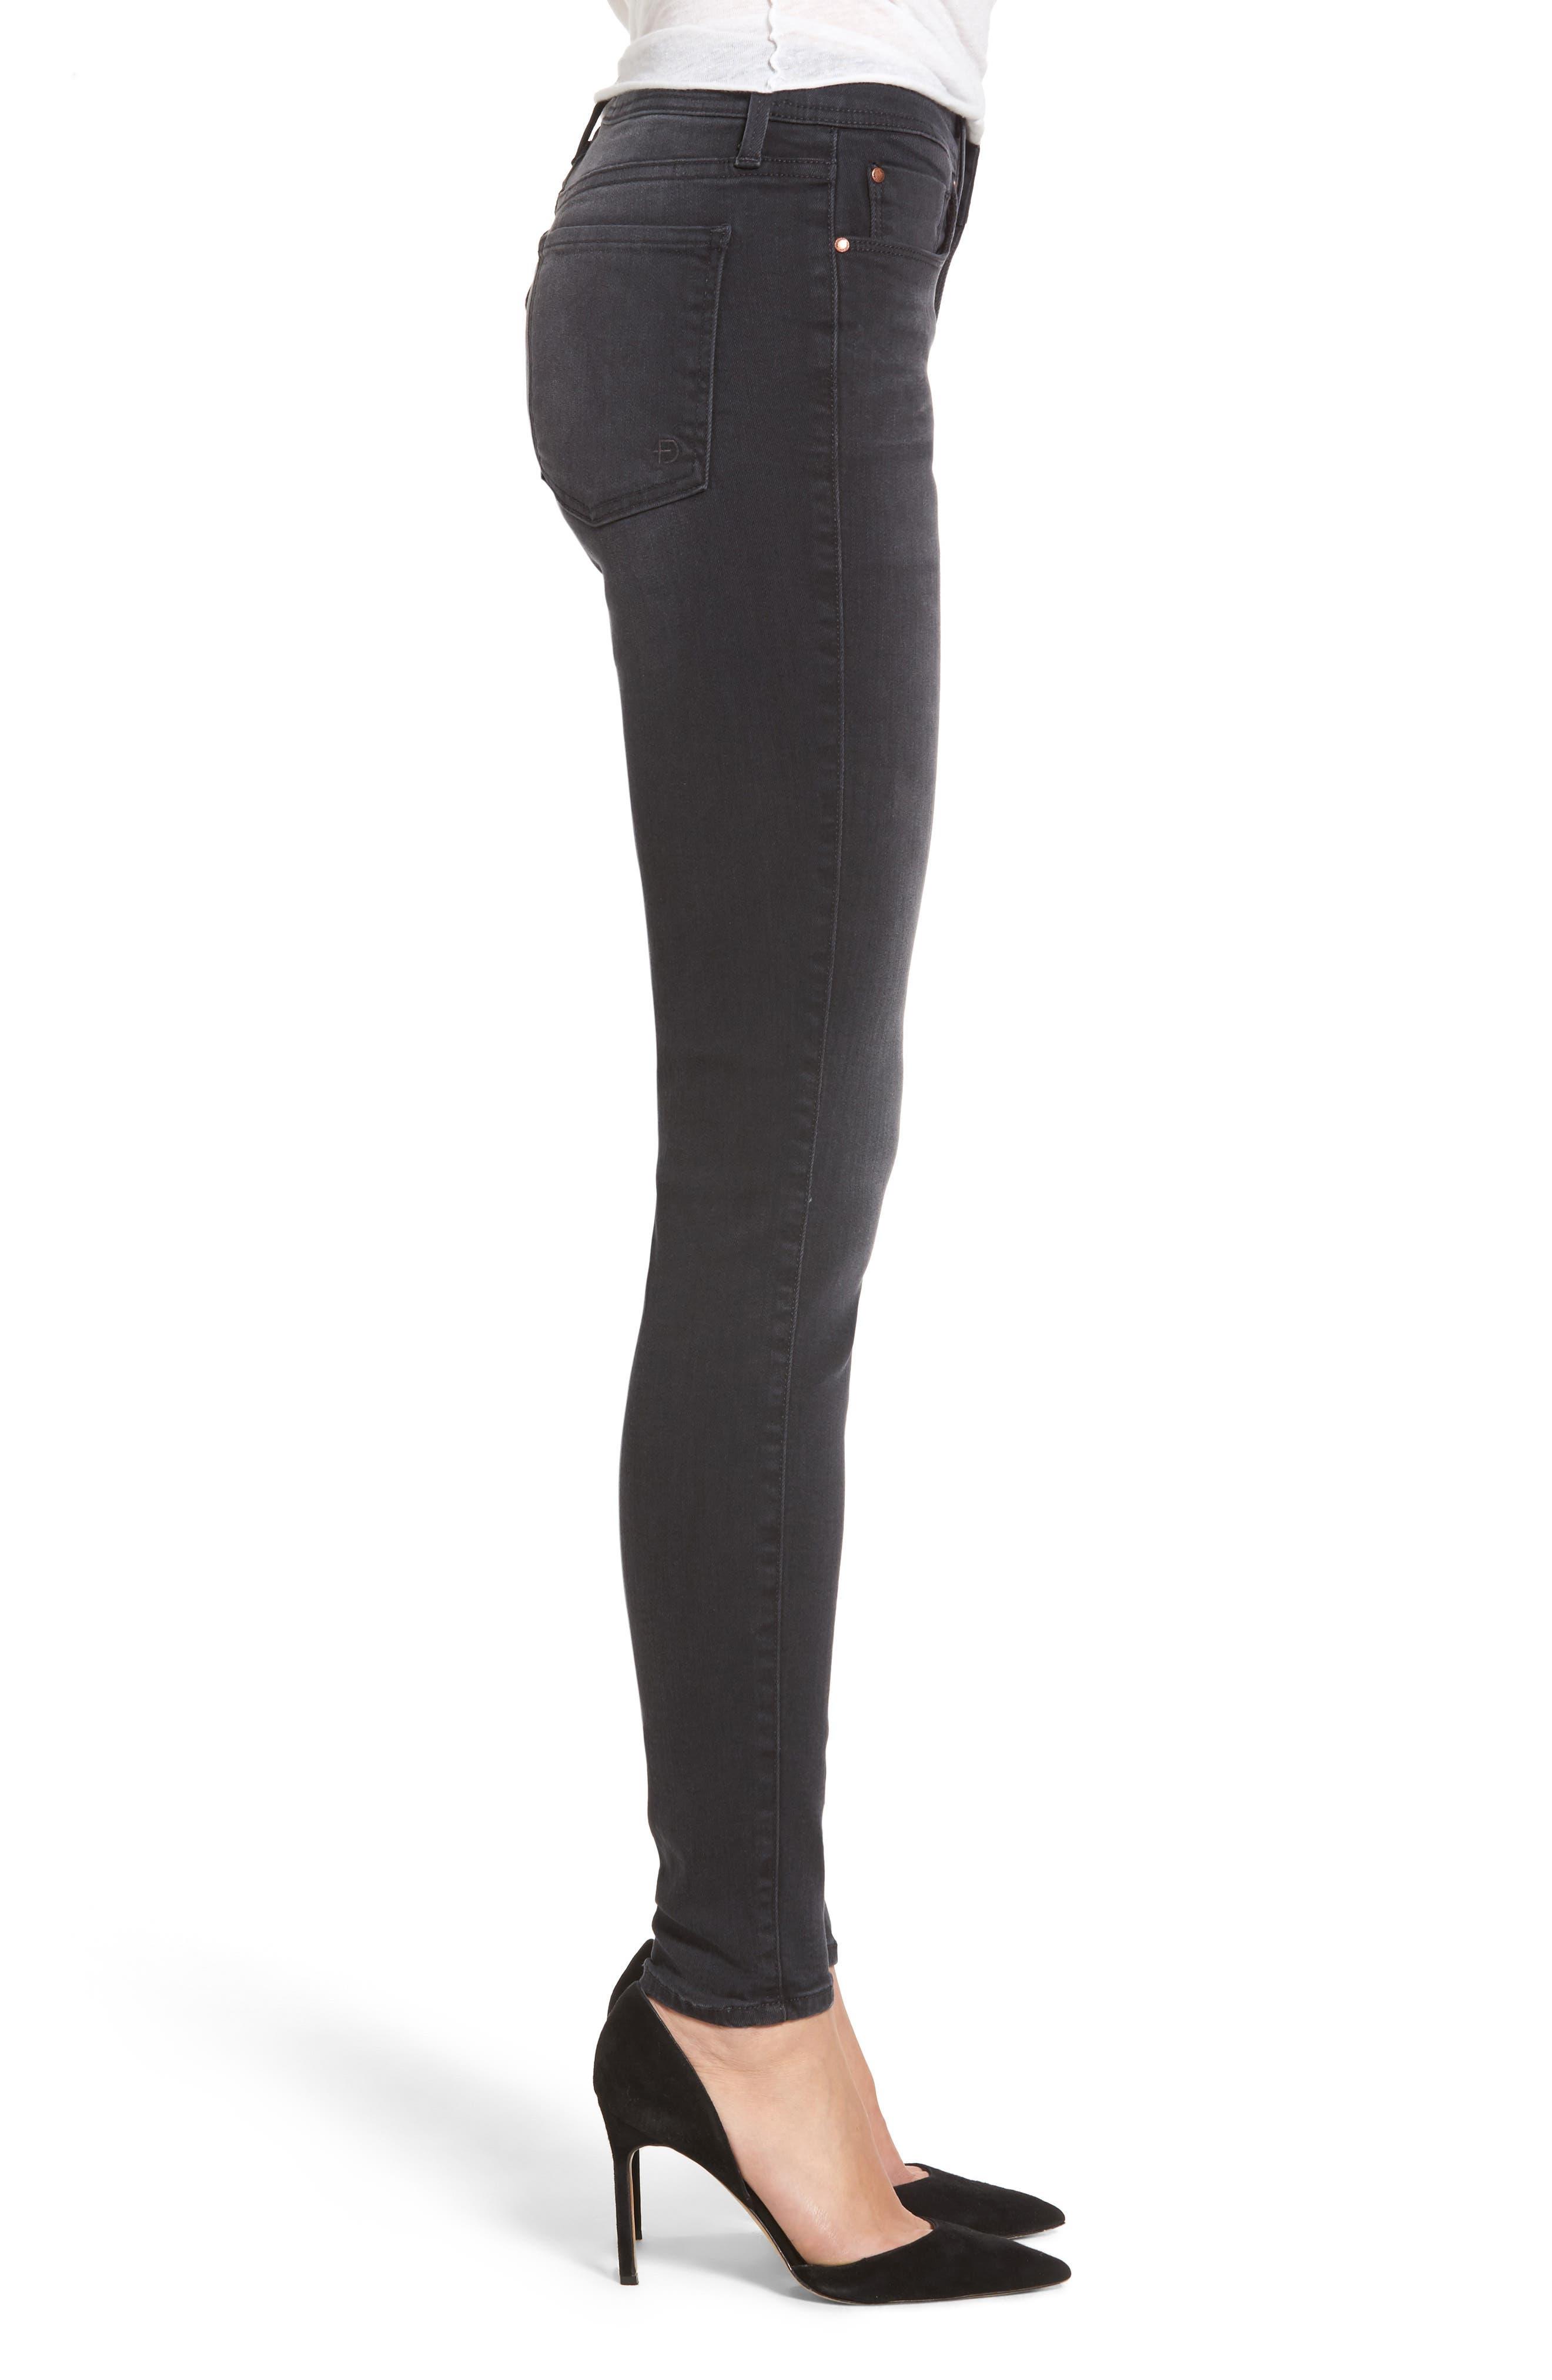 Belvedere Skinny Jeans,                             Alternate thumbnail 3, color,                             001